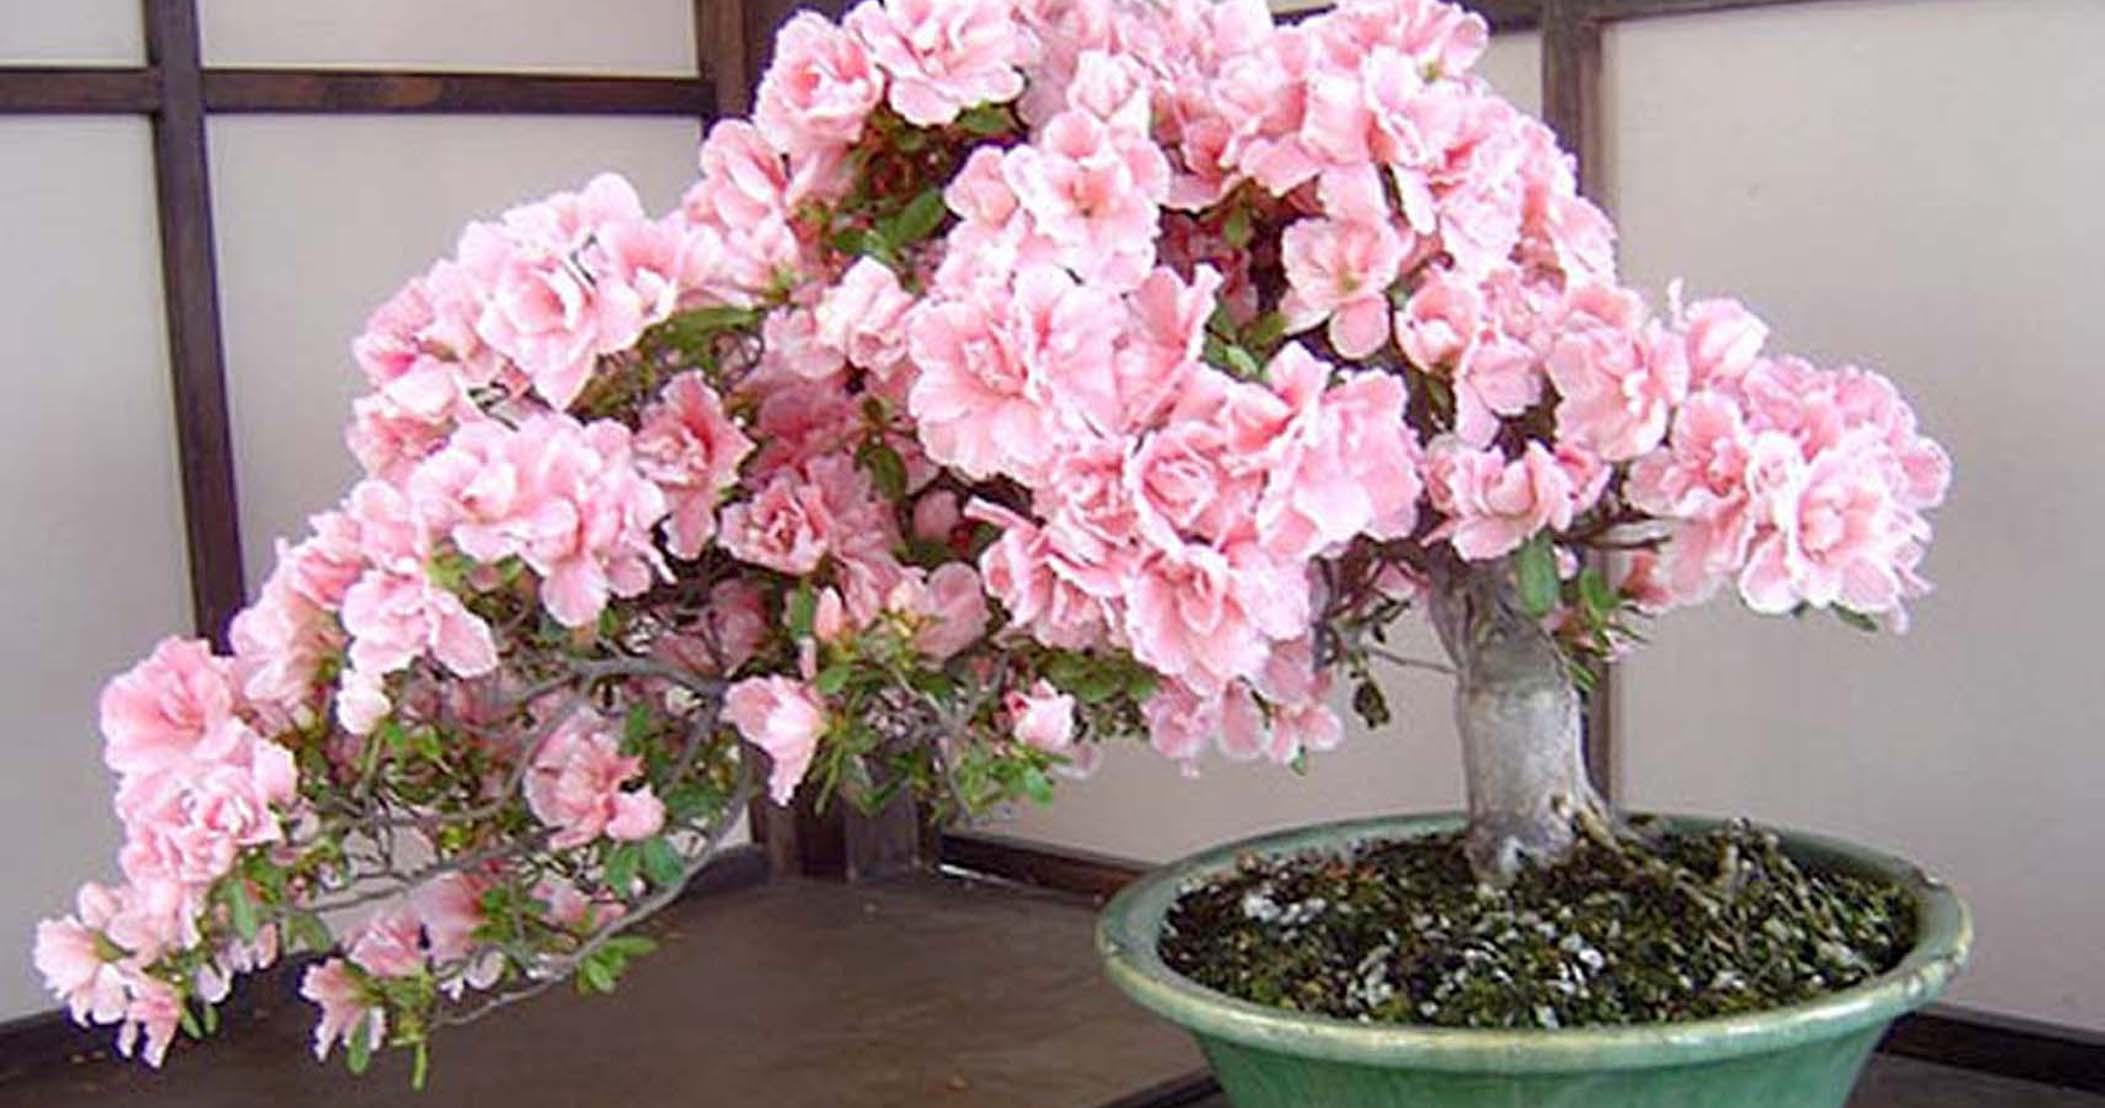 Fullsize Of Cherry Blossom Bonsai Tree